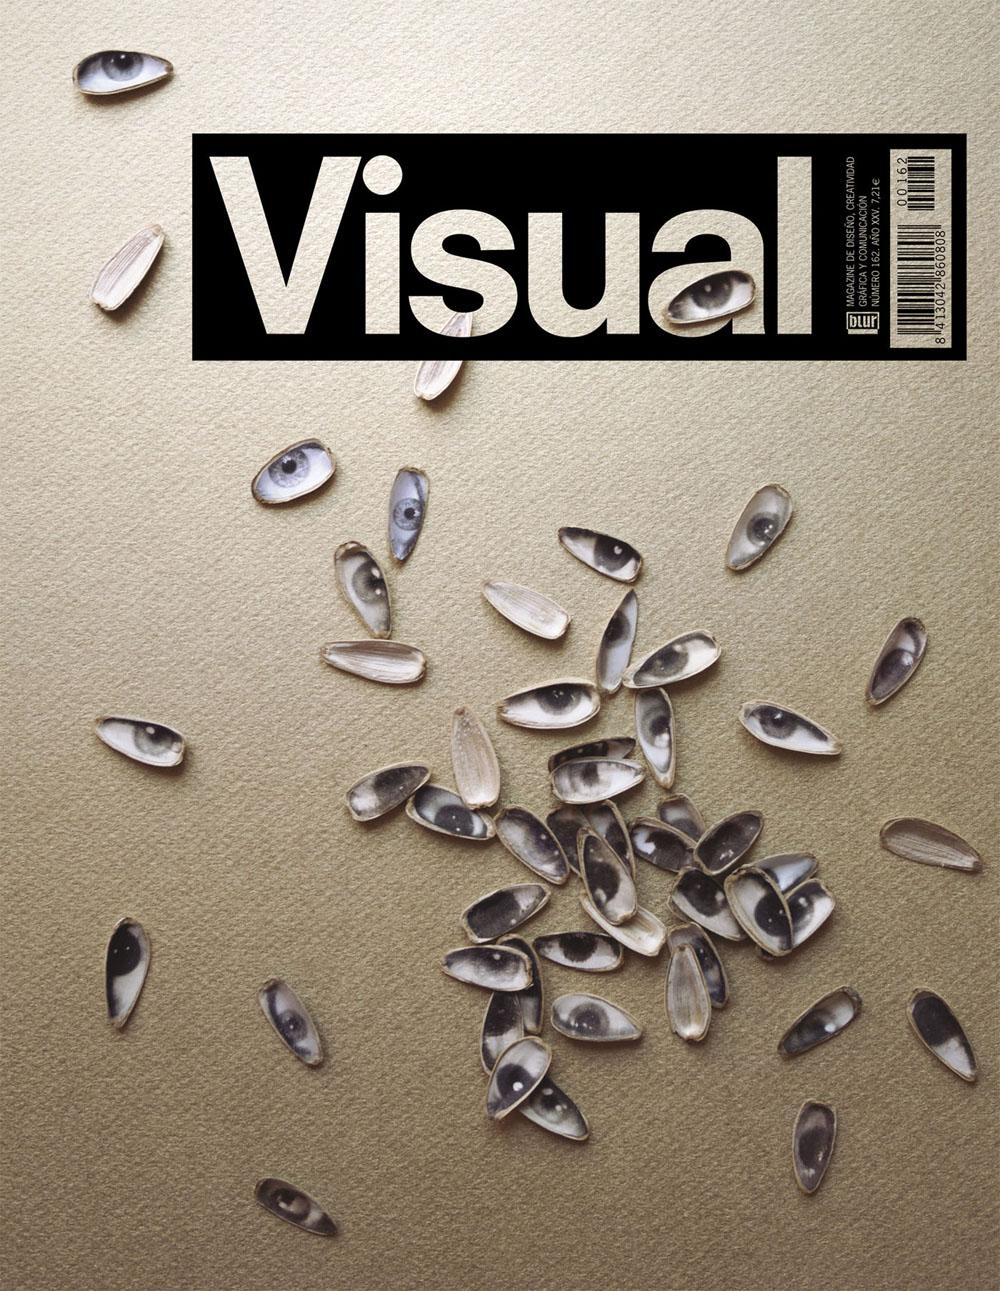 ilustracion_portada_revista_visual_ojos_pipas01